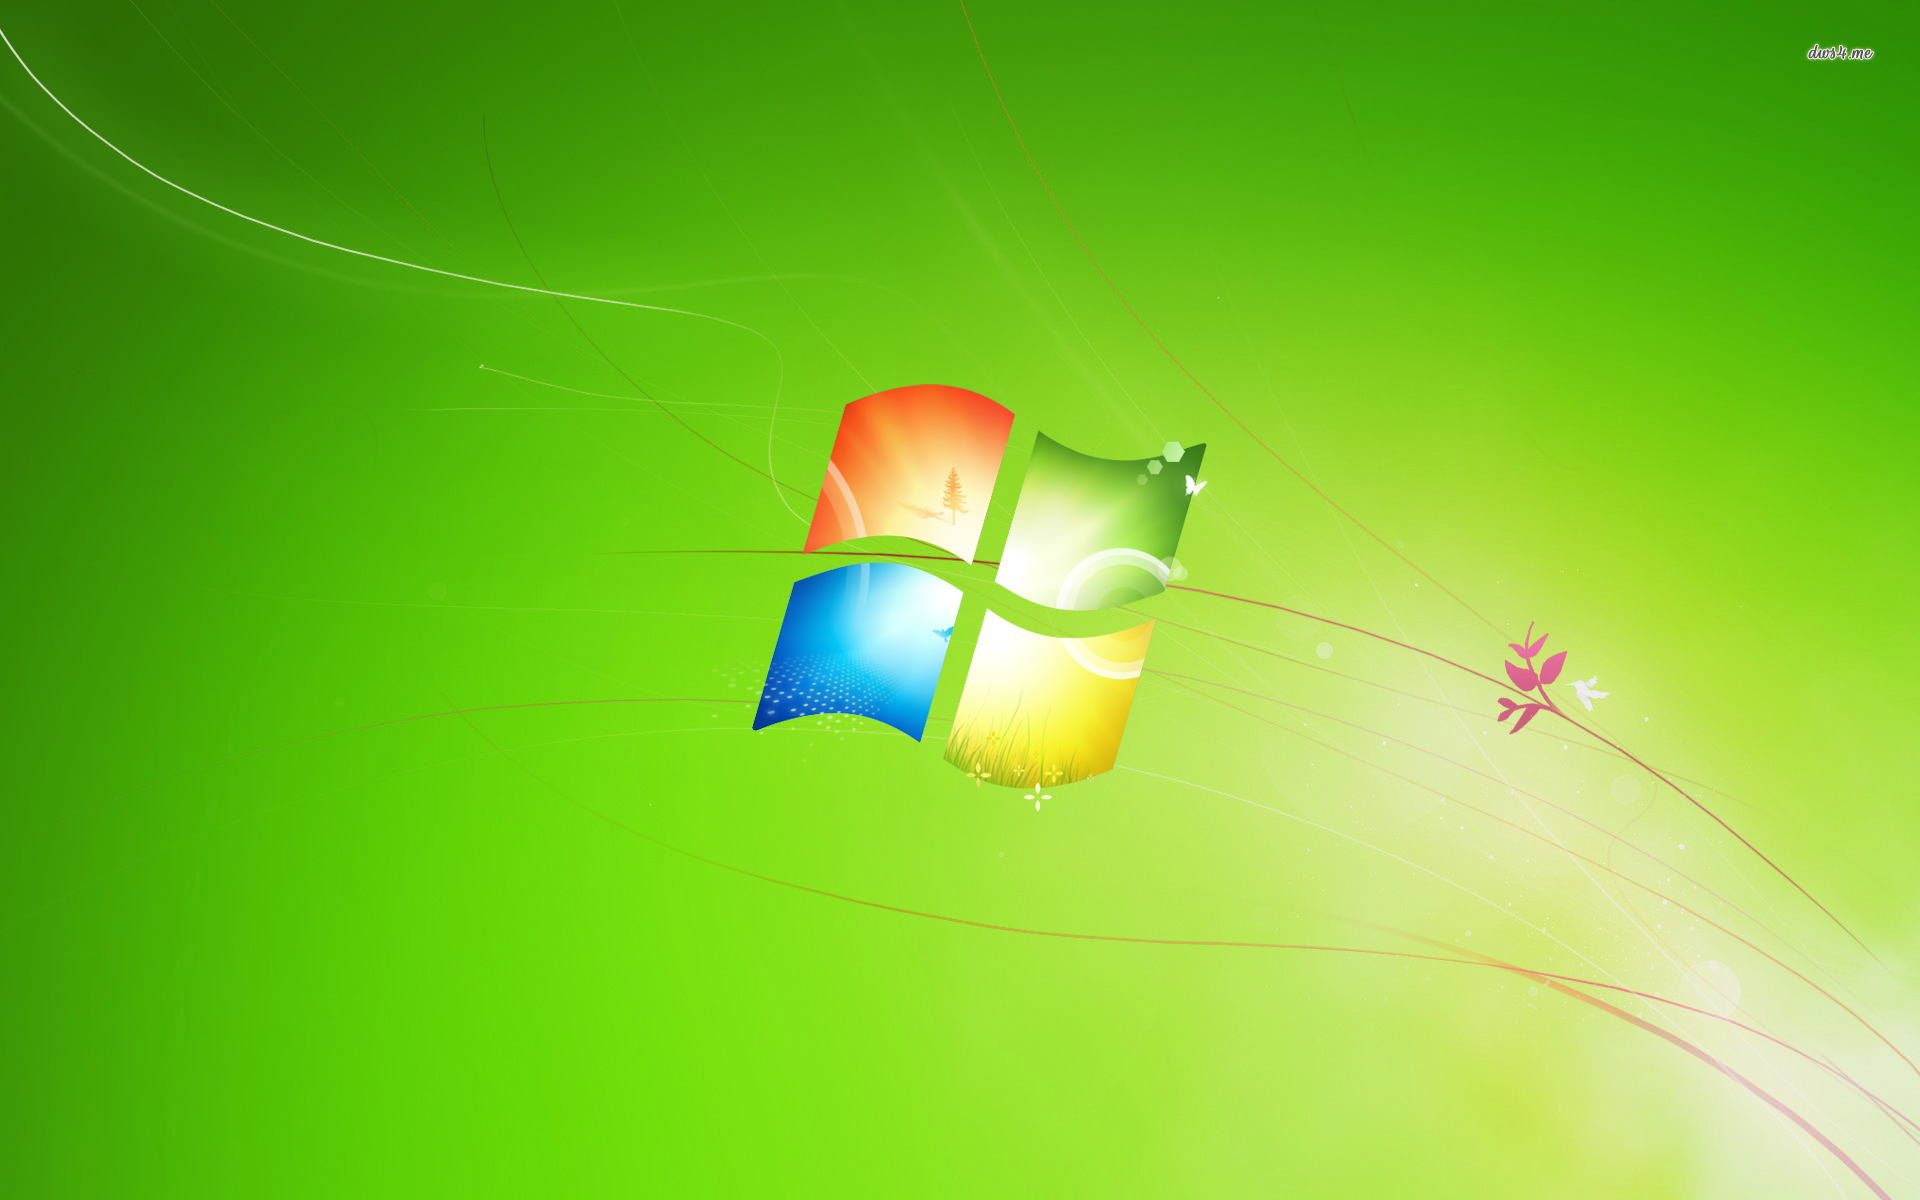 how to change windows xp to windows 7